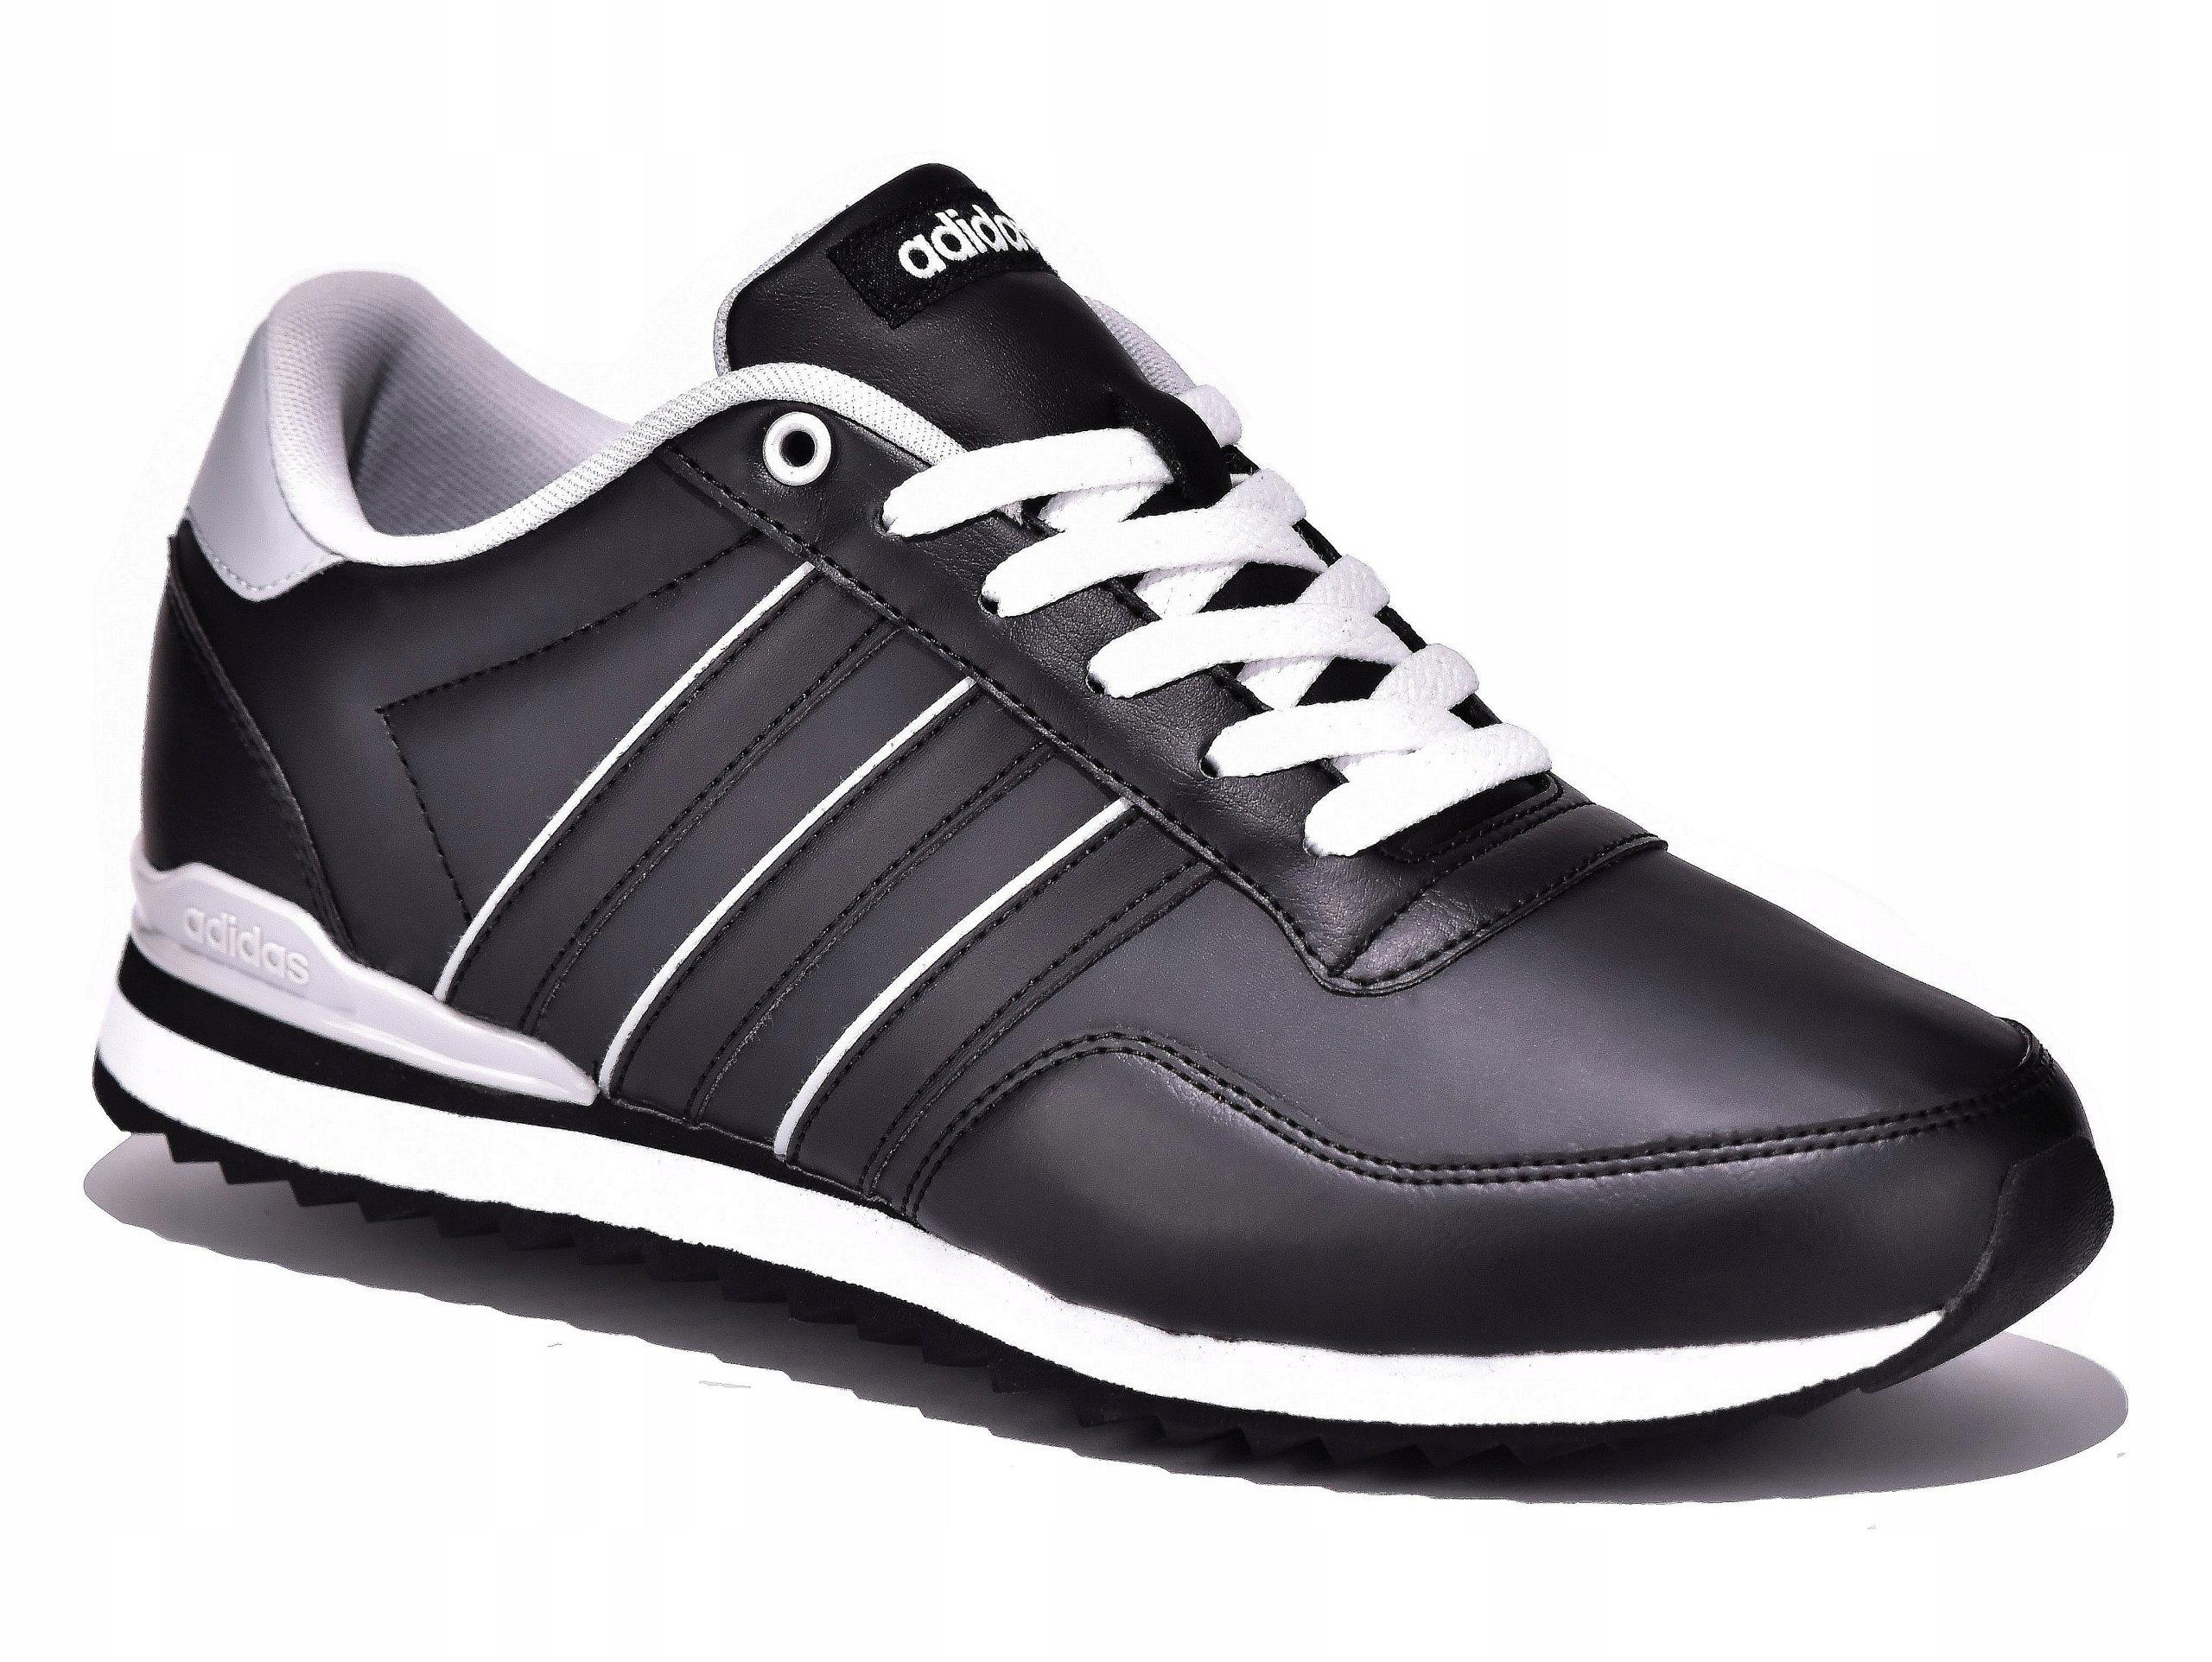 cbd906ee Buty męskie Adidas JOGGER CL AW4073 ZX r.44 2/3 - 6858838448 ...